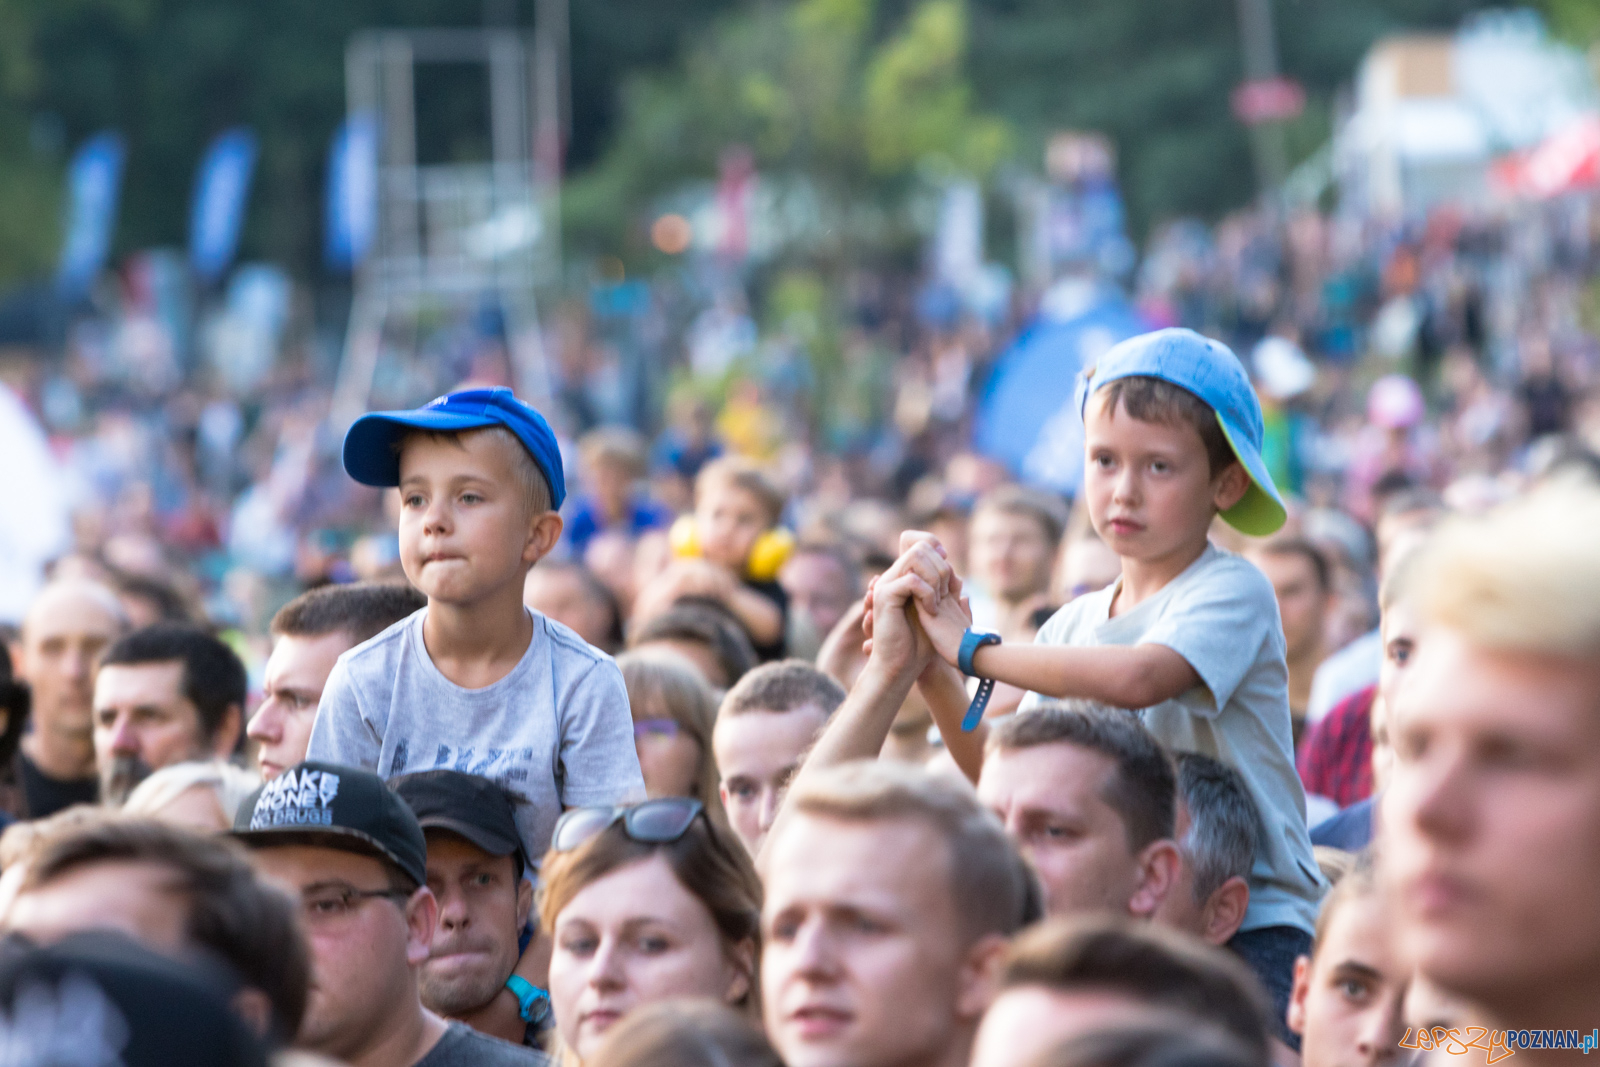 #NaFalach – Luxfest – Luxtorpeda